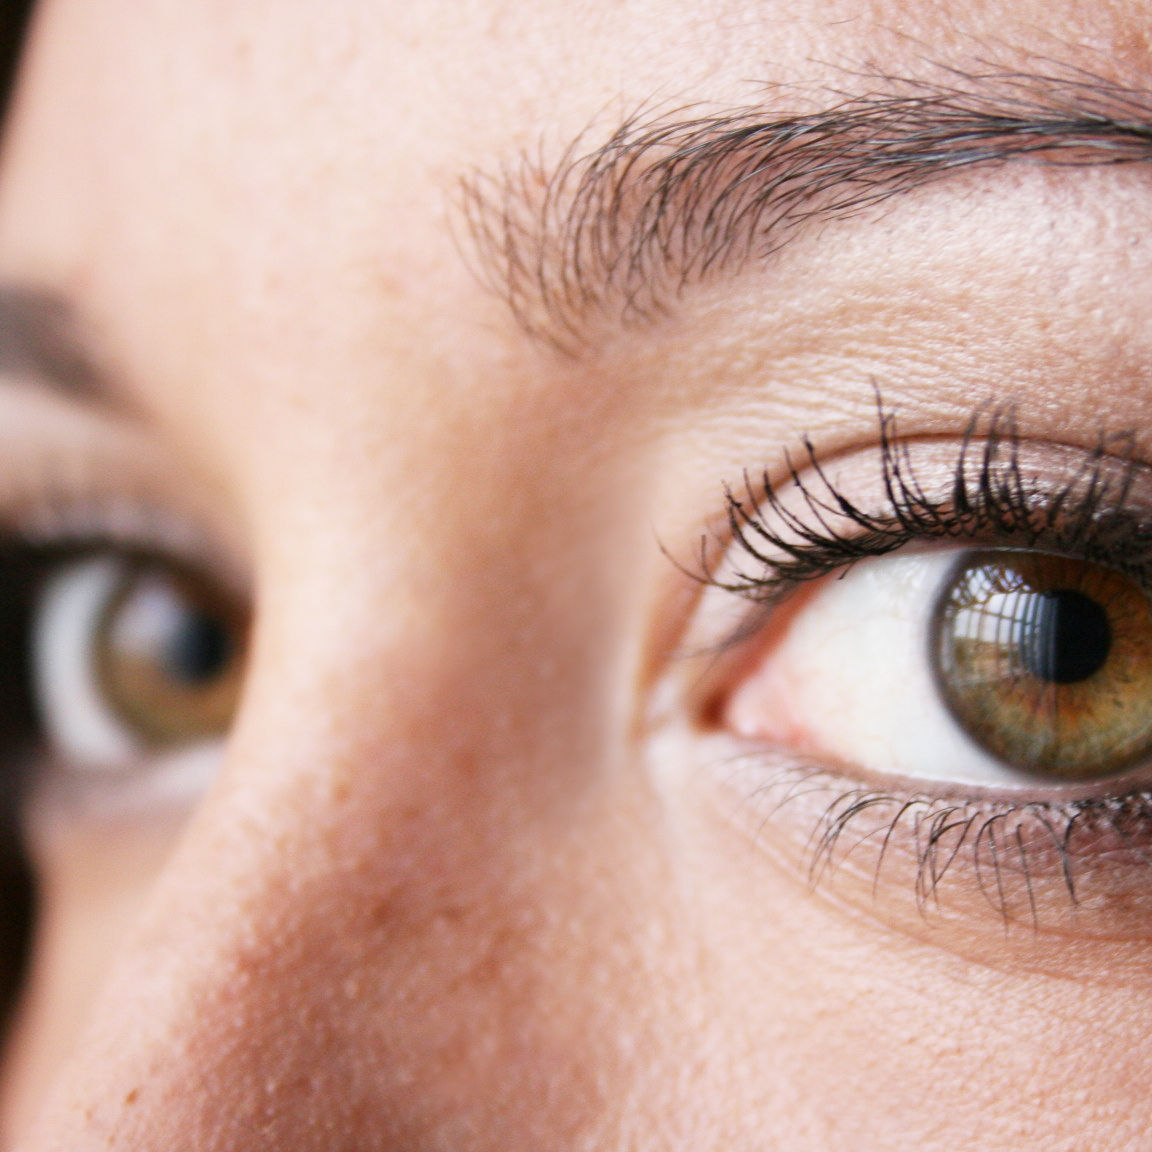 Eyes ethjyc